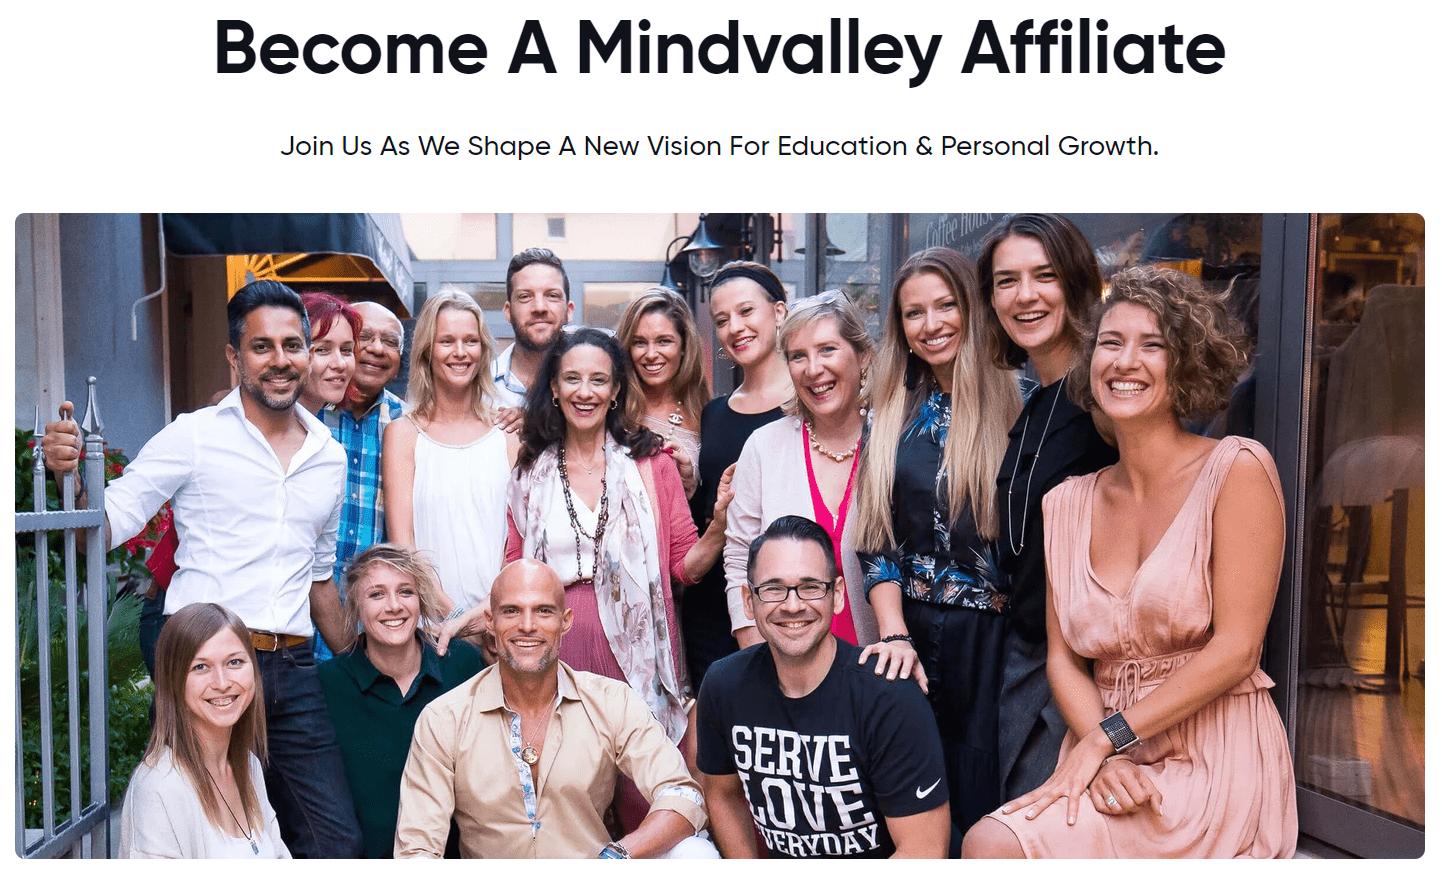 Mindvalley Affiliate